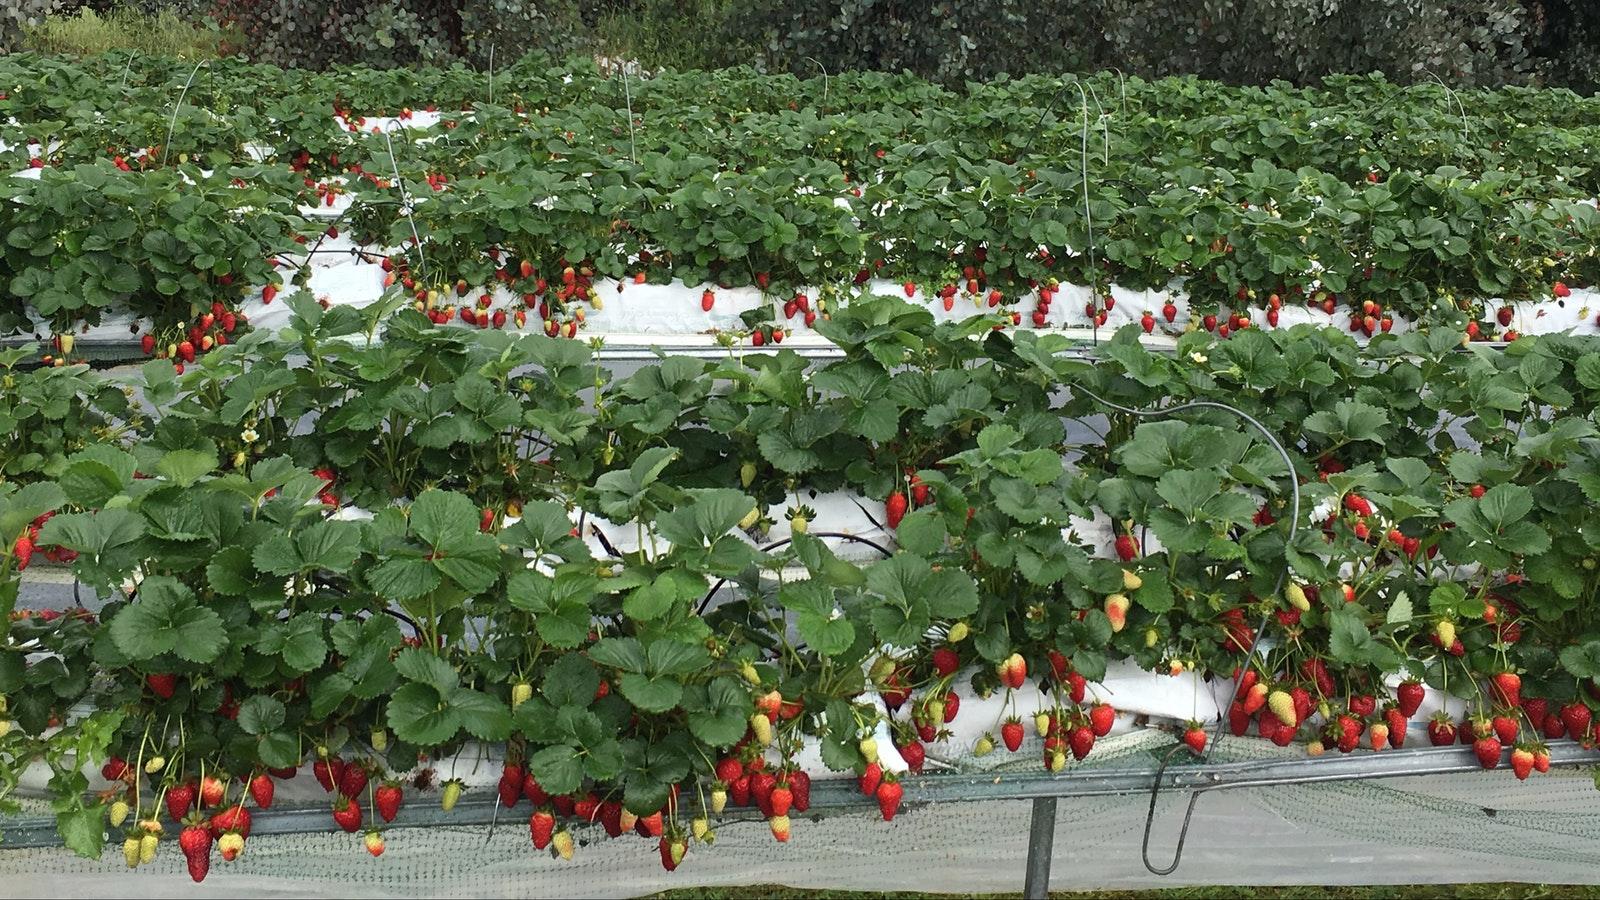 Strawberry crop in full fruit